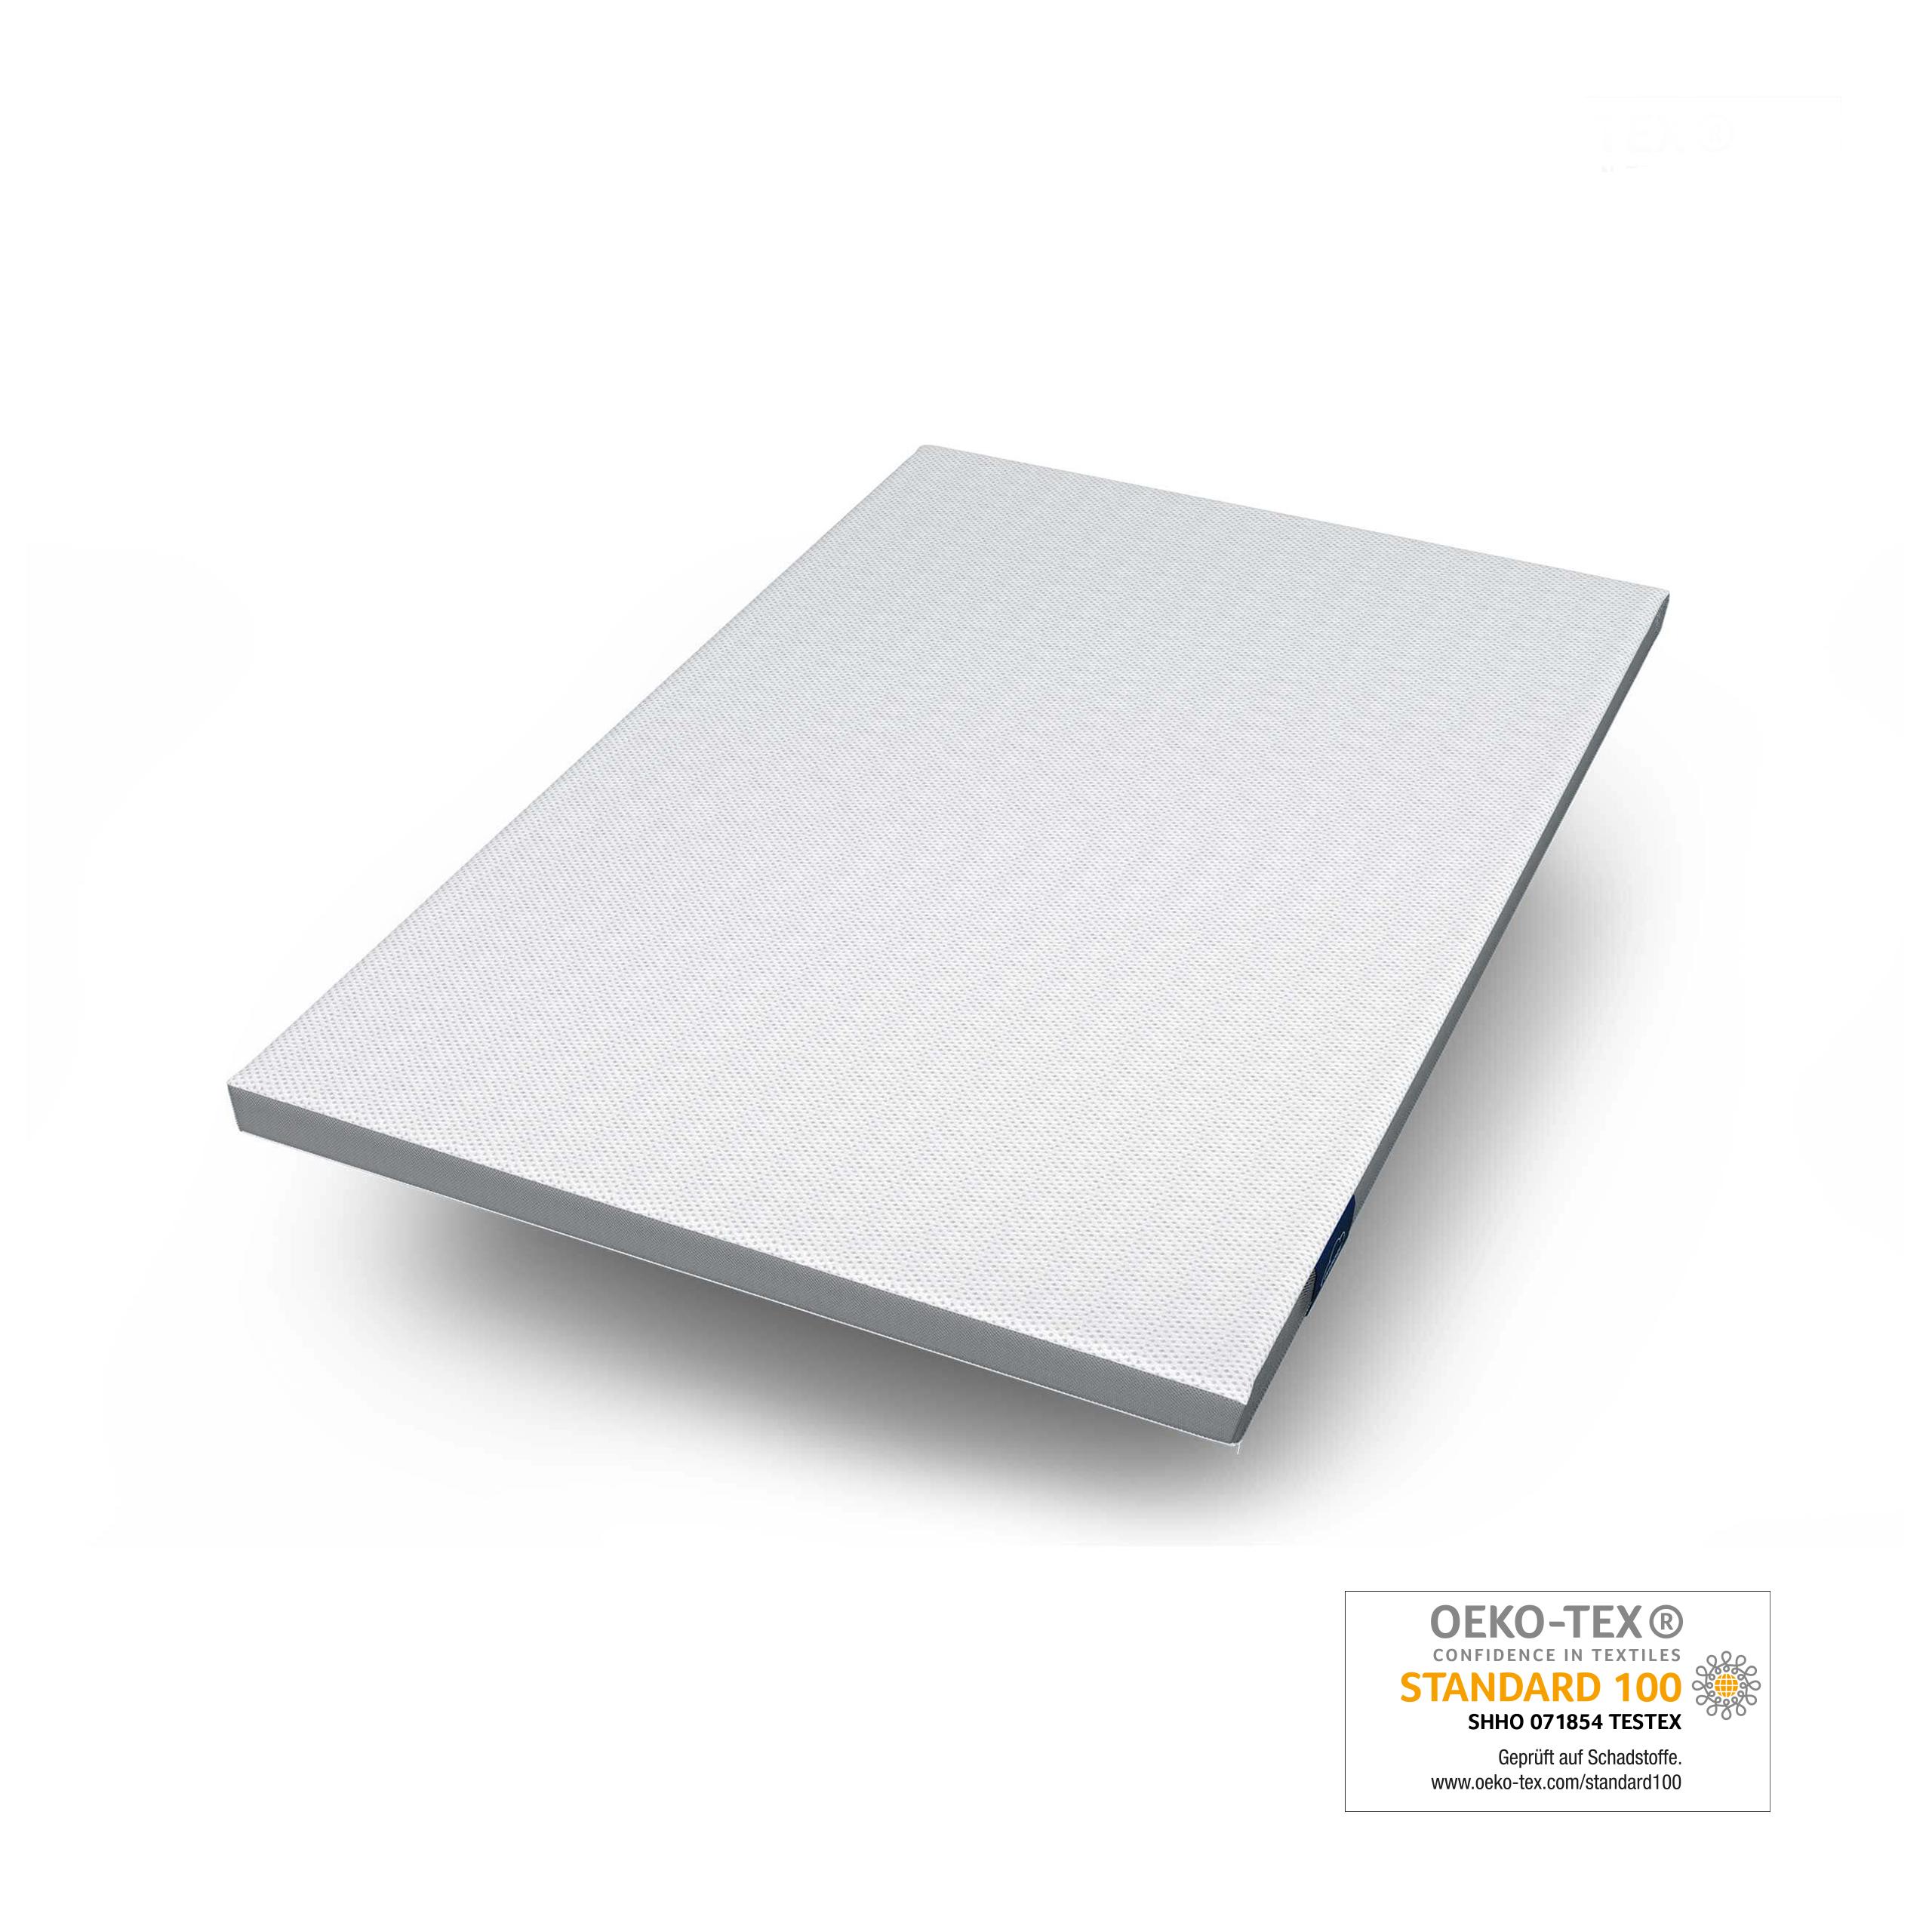 Genius eazzzy | Matratzentopper 140 x 200 x 7 cm A19205